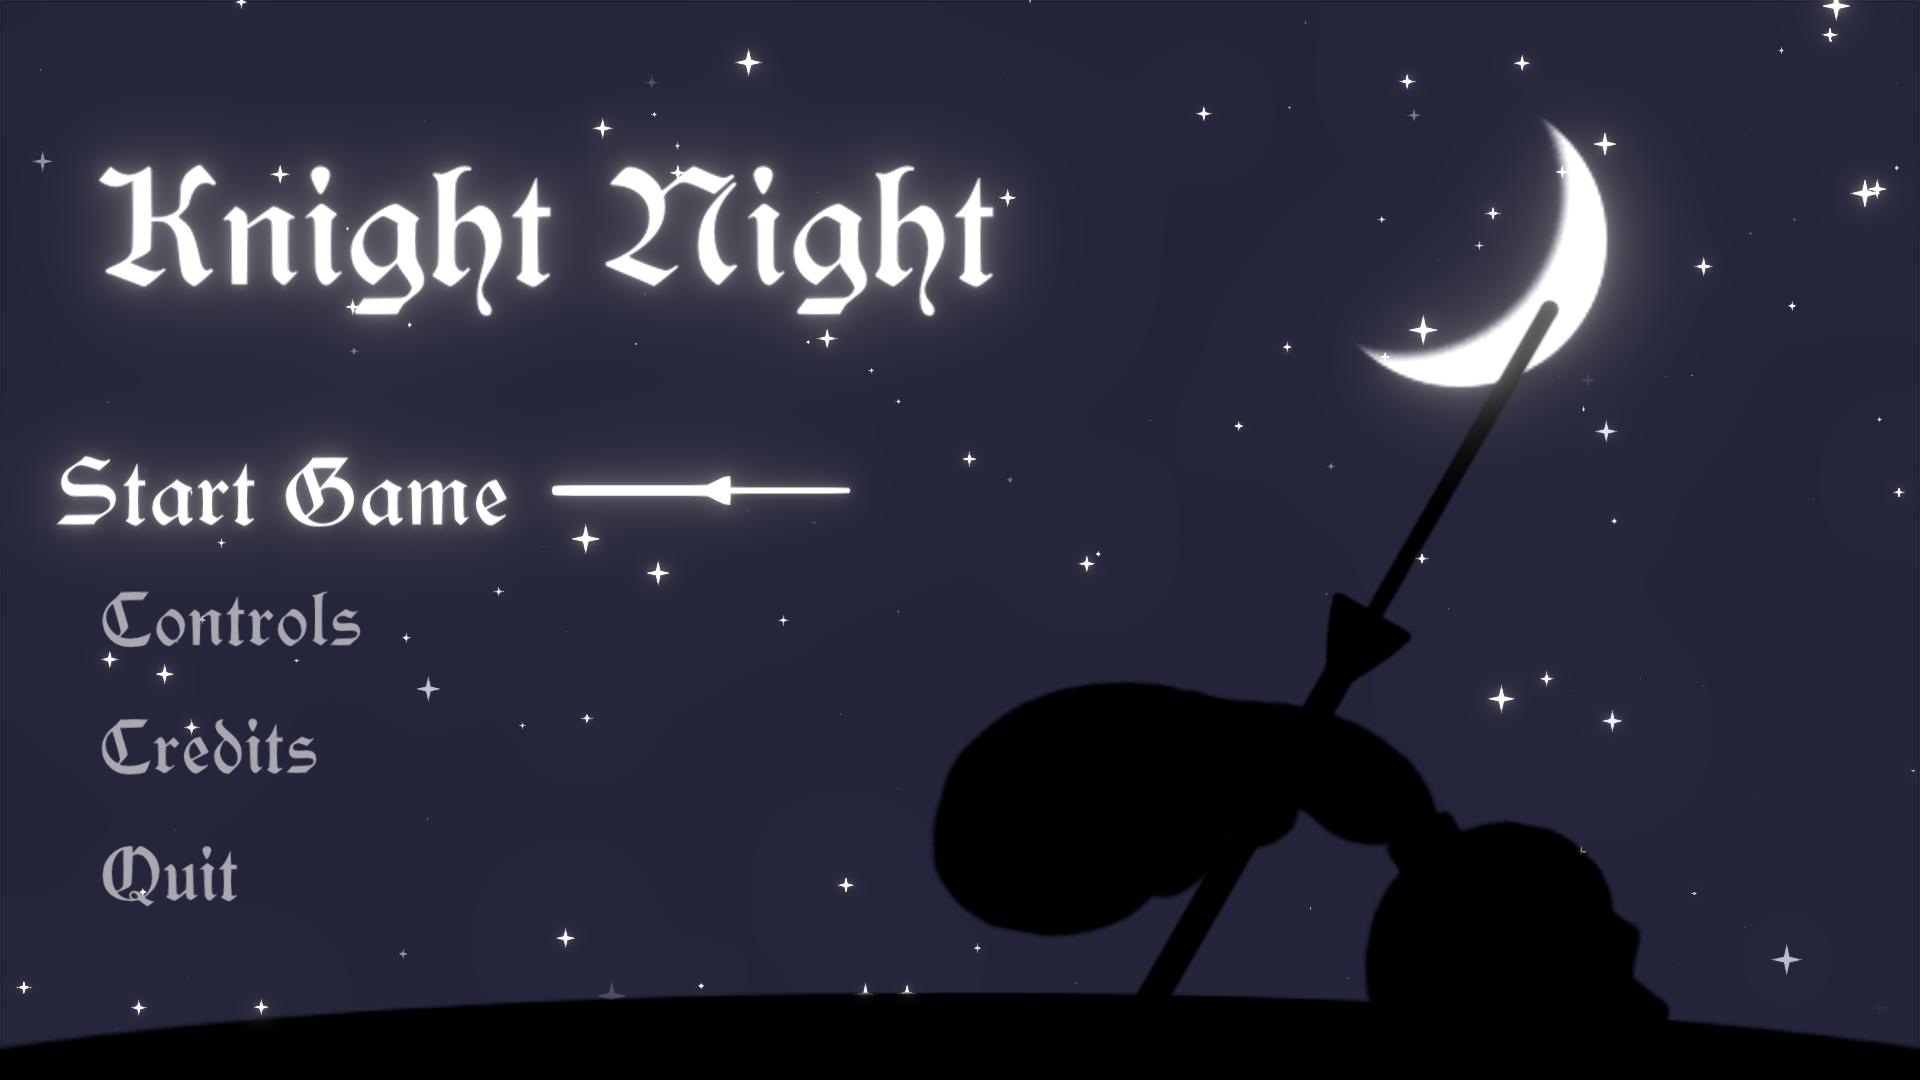 KnightNight1